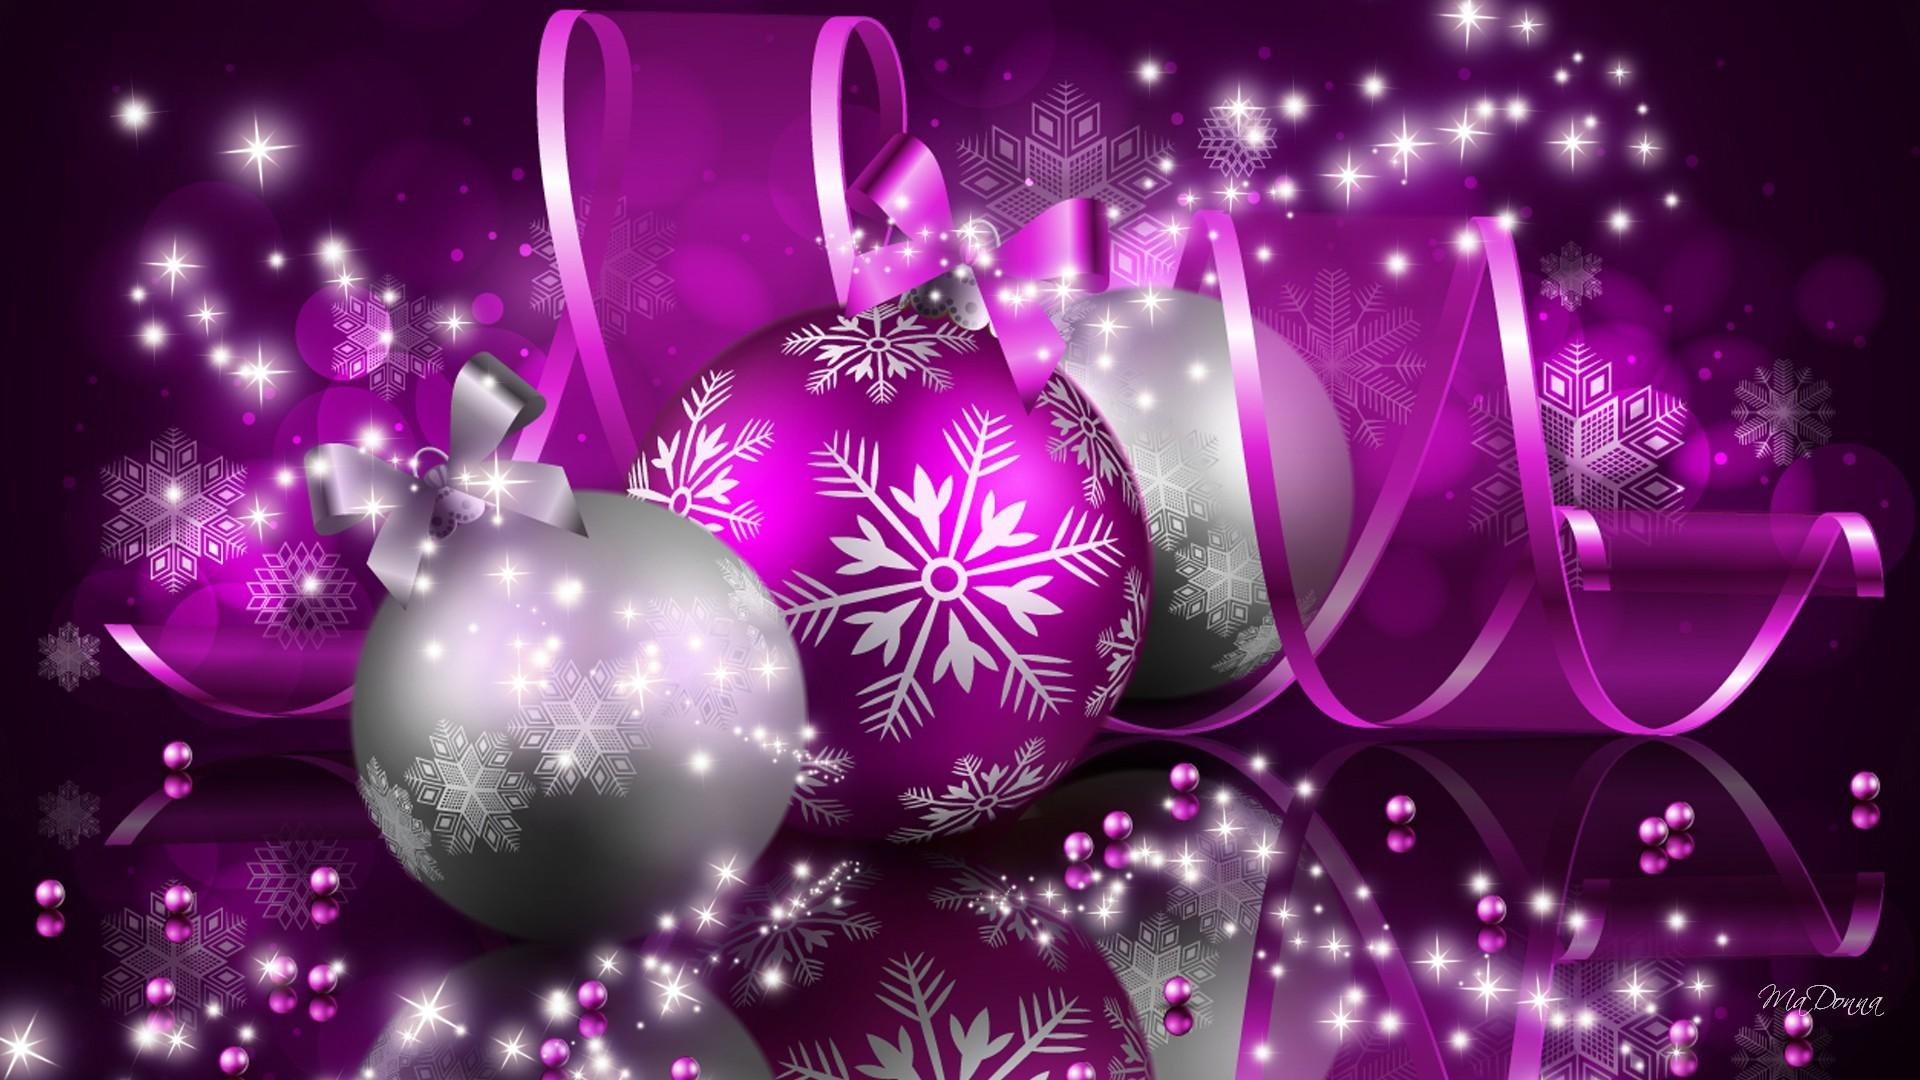 Christmas Decorations Haammss Free Wallpapers Toptenpack Com Purple Home  Office Decorating Ideas Decor Liquidators.